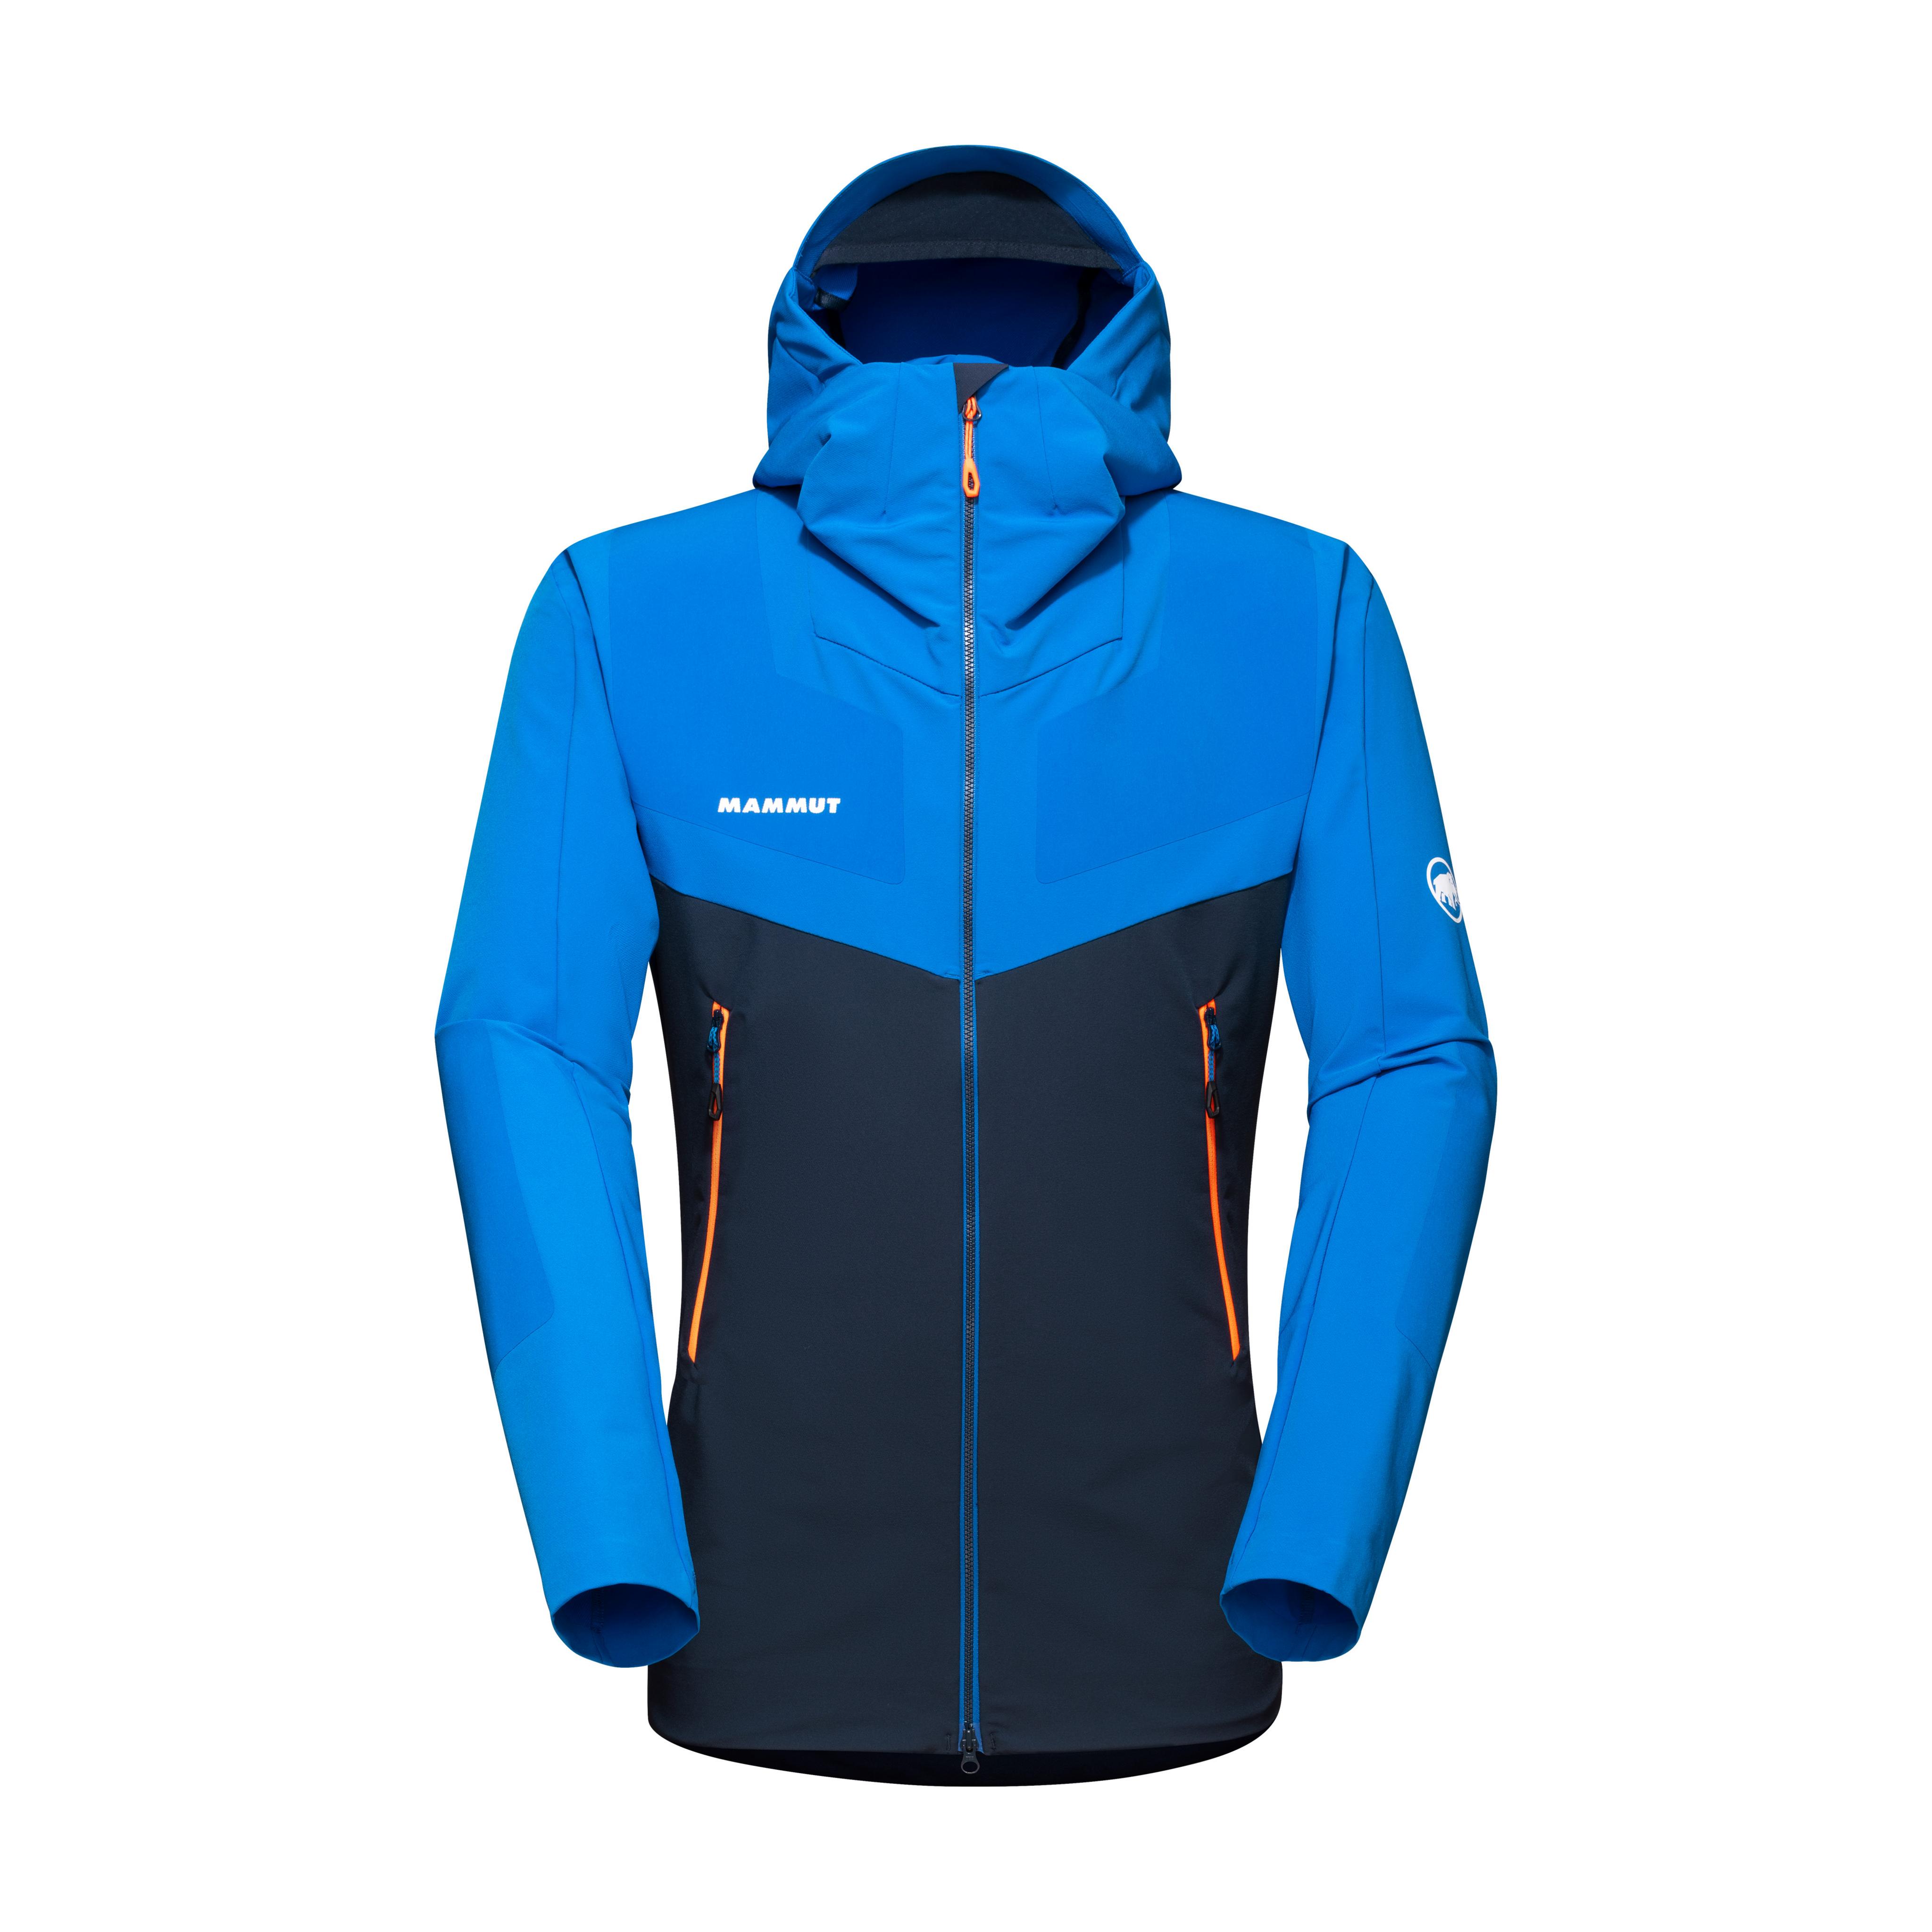 Aenergy Pro SO Hooded Jacket Men - marine-ice, S thumbnail